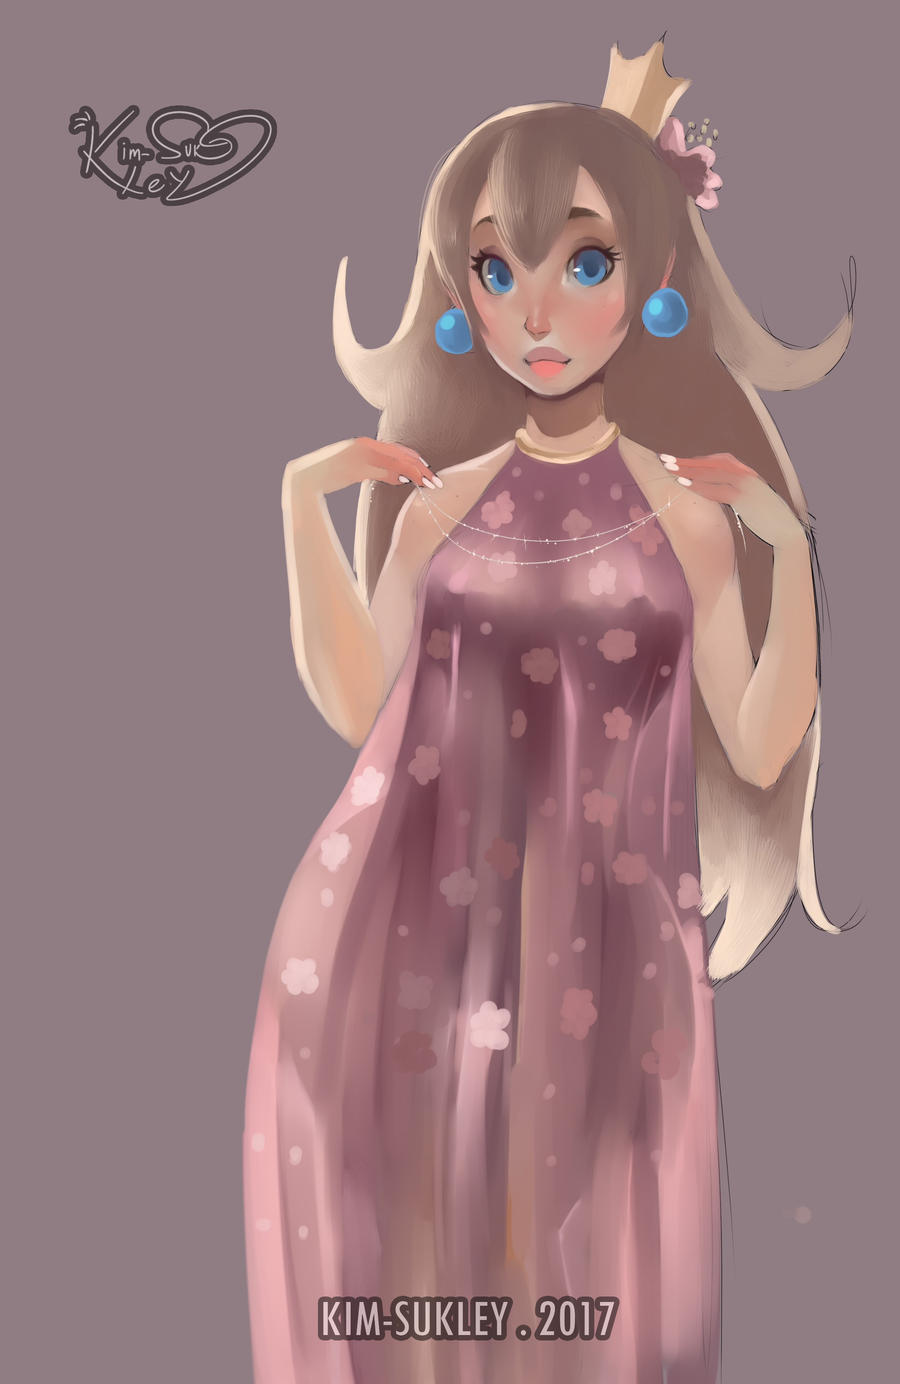 Blossom dress by Kim-SukLey